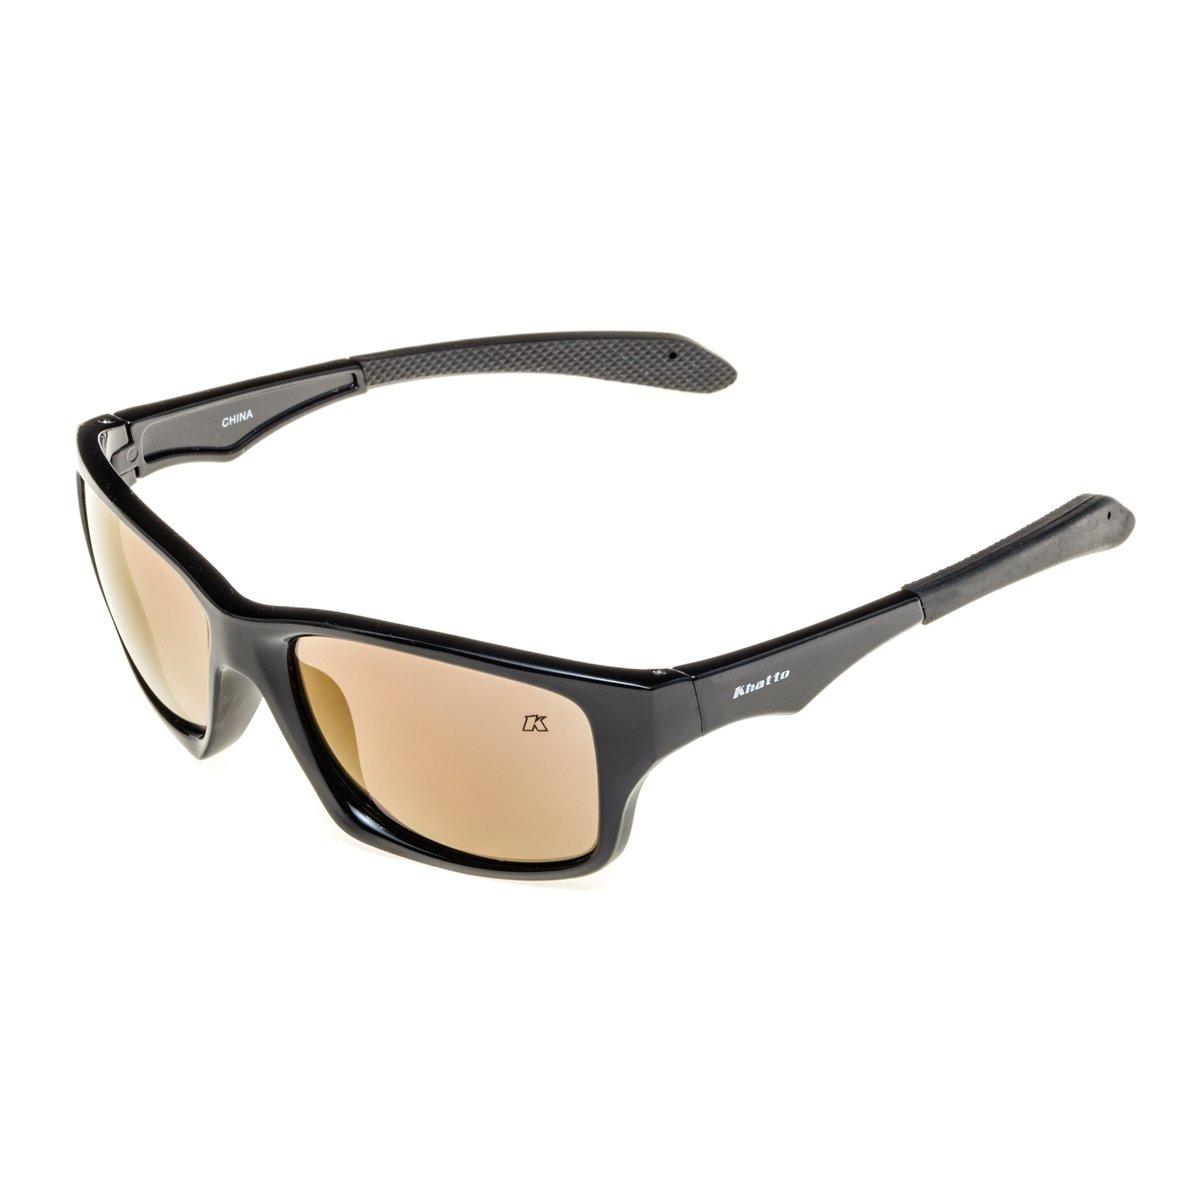 Óculos de Sol Khatto KTS60933 - Compre Agora   Netshoes 0fb35cc7e1